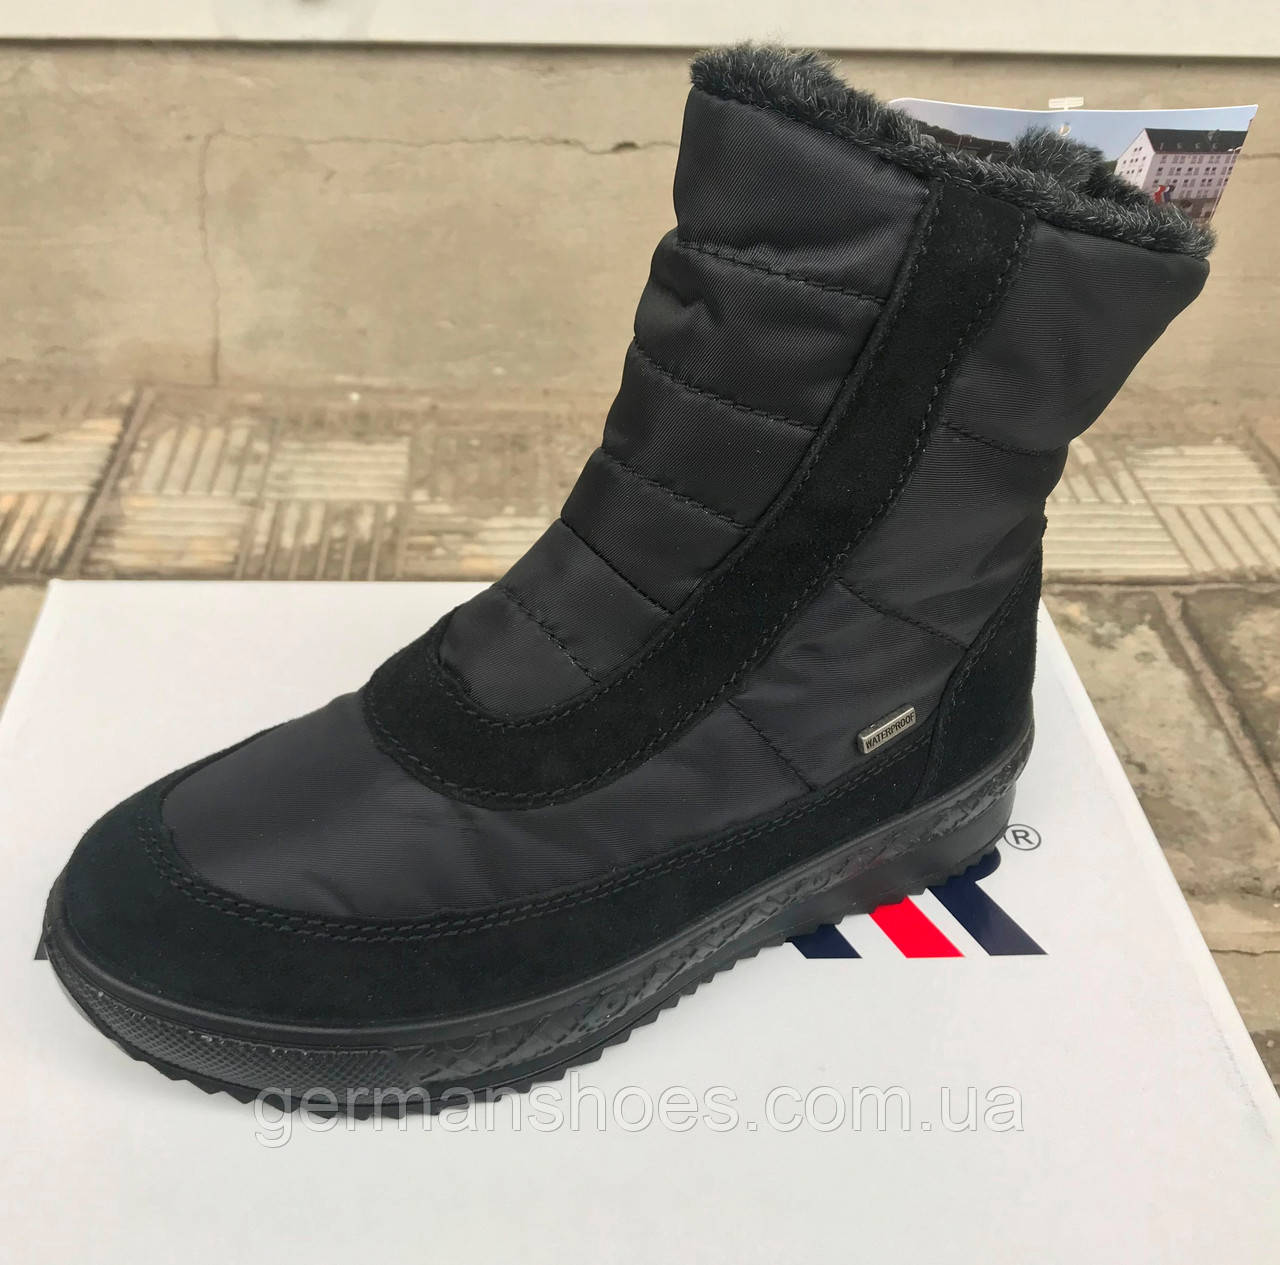 Ботинки женские Romika 8201R111